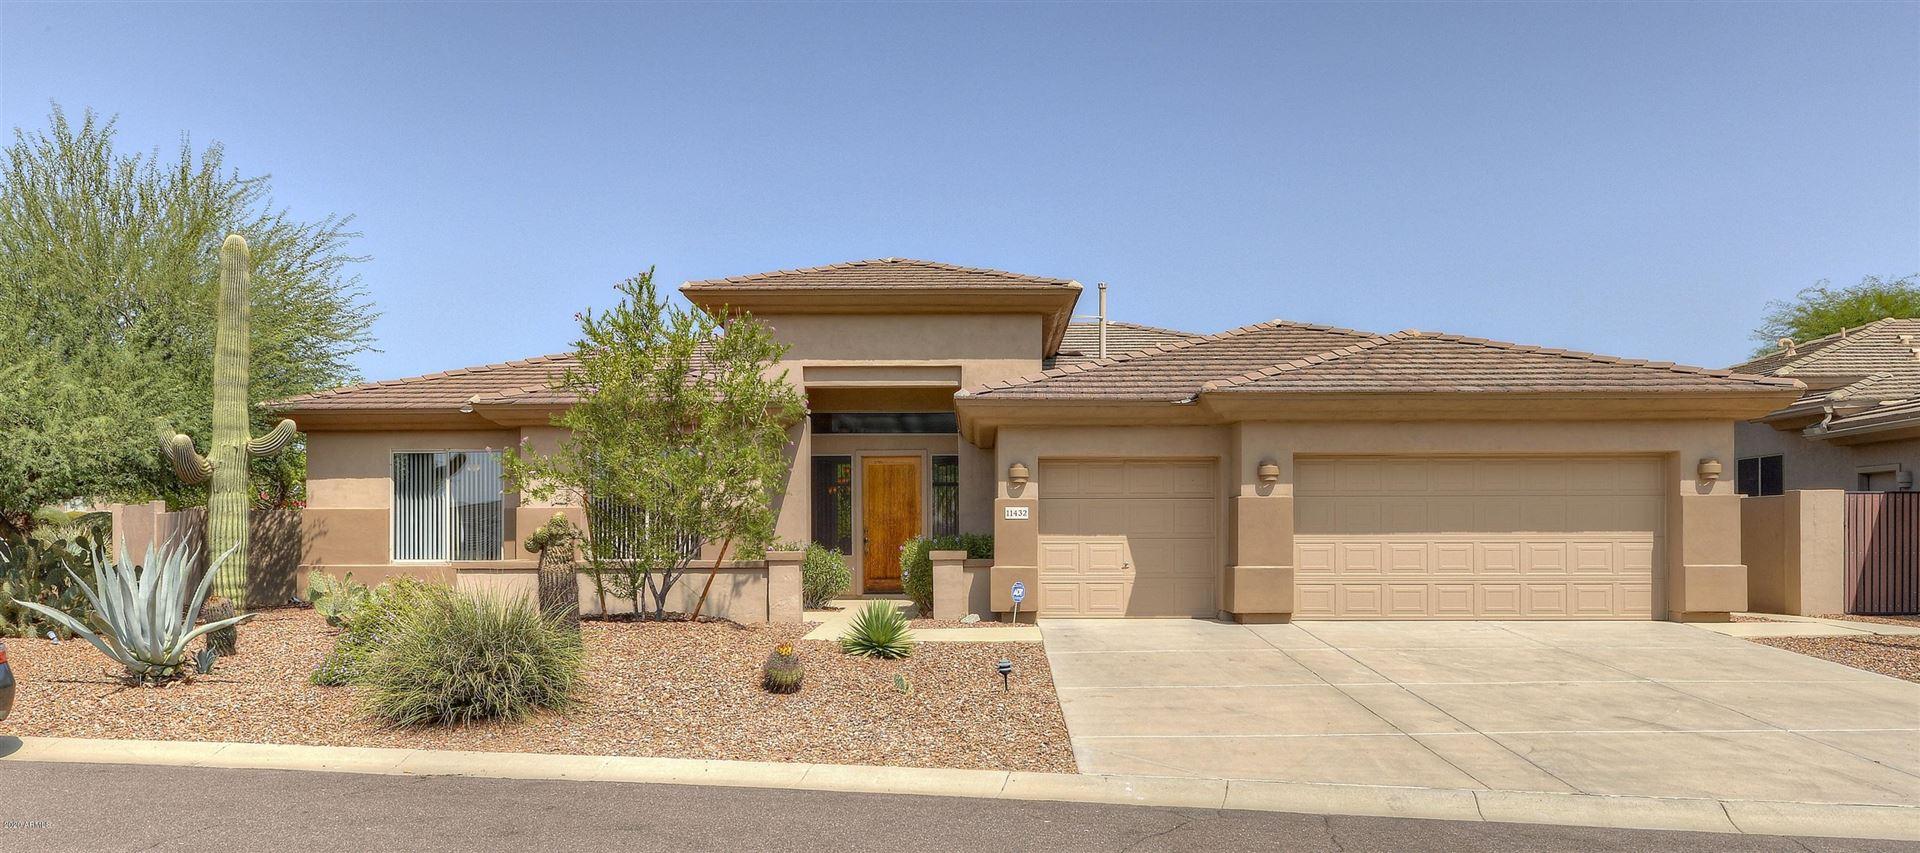 11432 E MARK Lane, Scottsdale, AZ 85262 - MLS#: 6134776